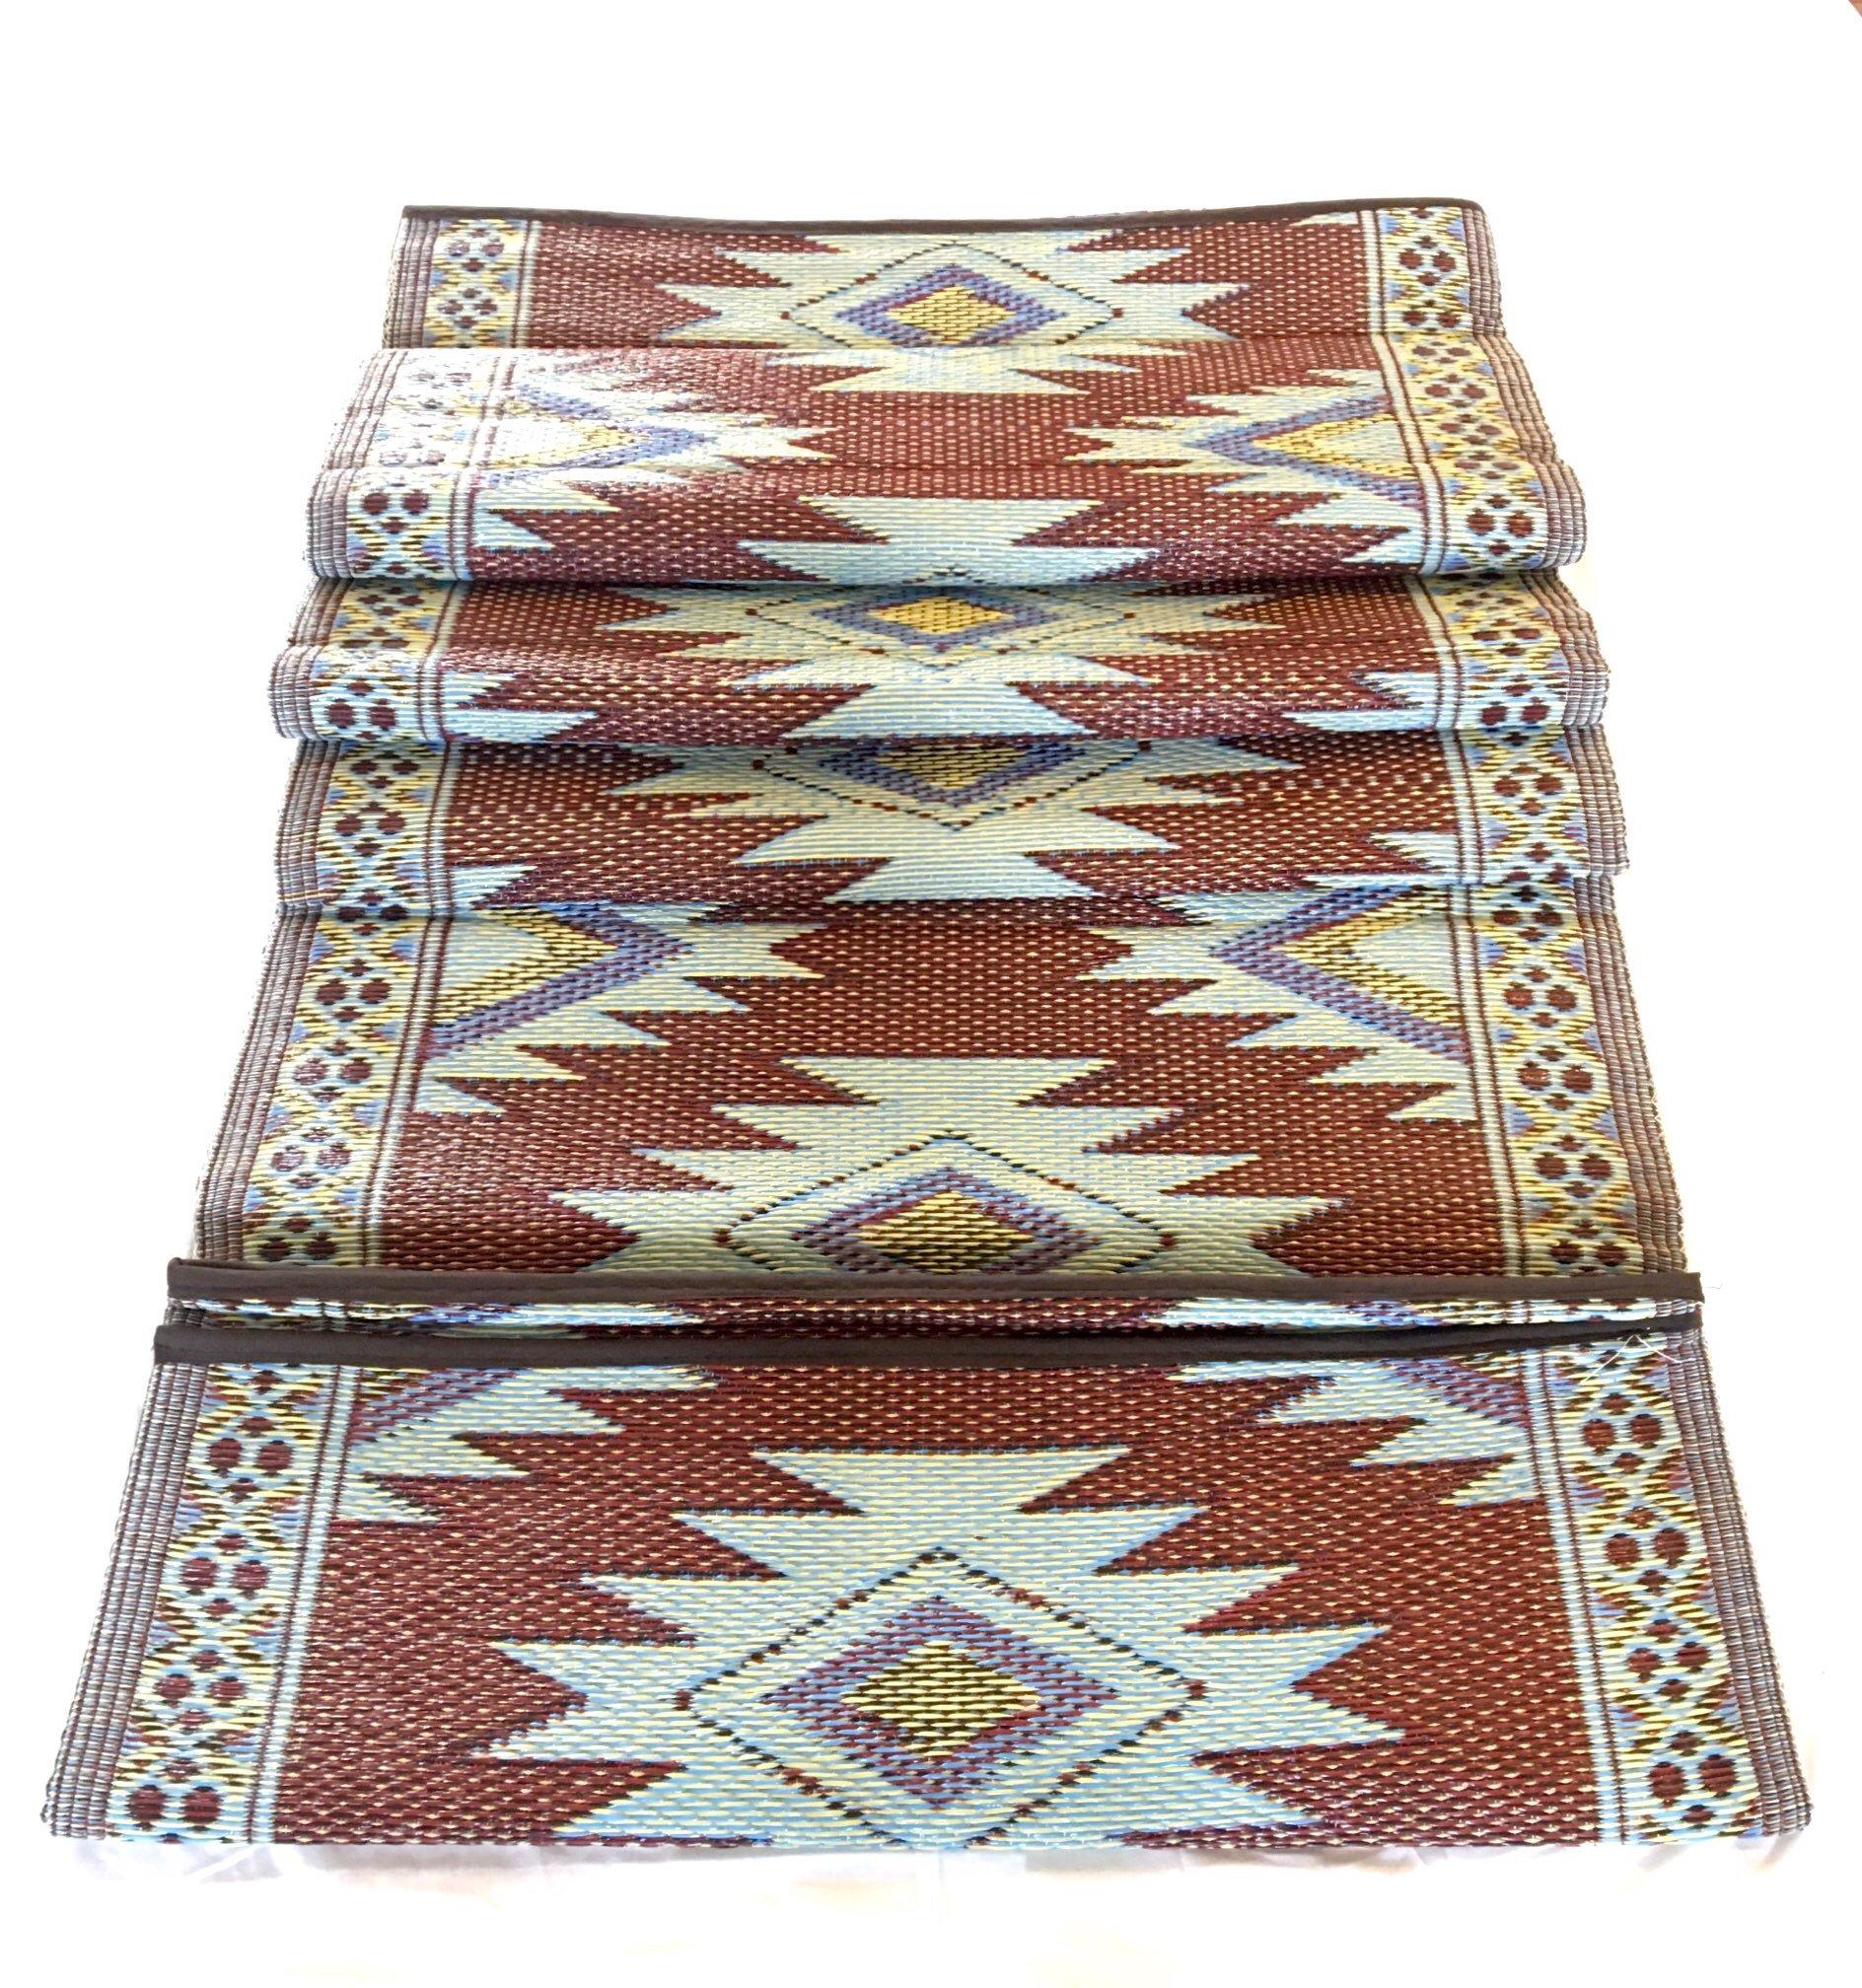 9'x12' Outdoor rugs Patio RV Camping Rug Mat Picnic Garden Reversible 20300 by BalajeesUSA